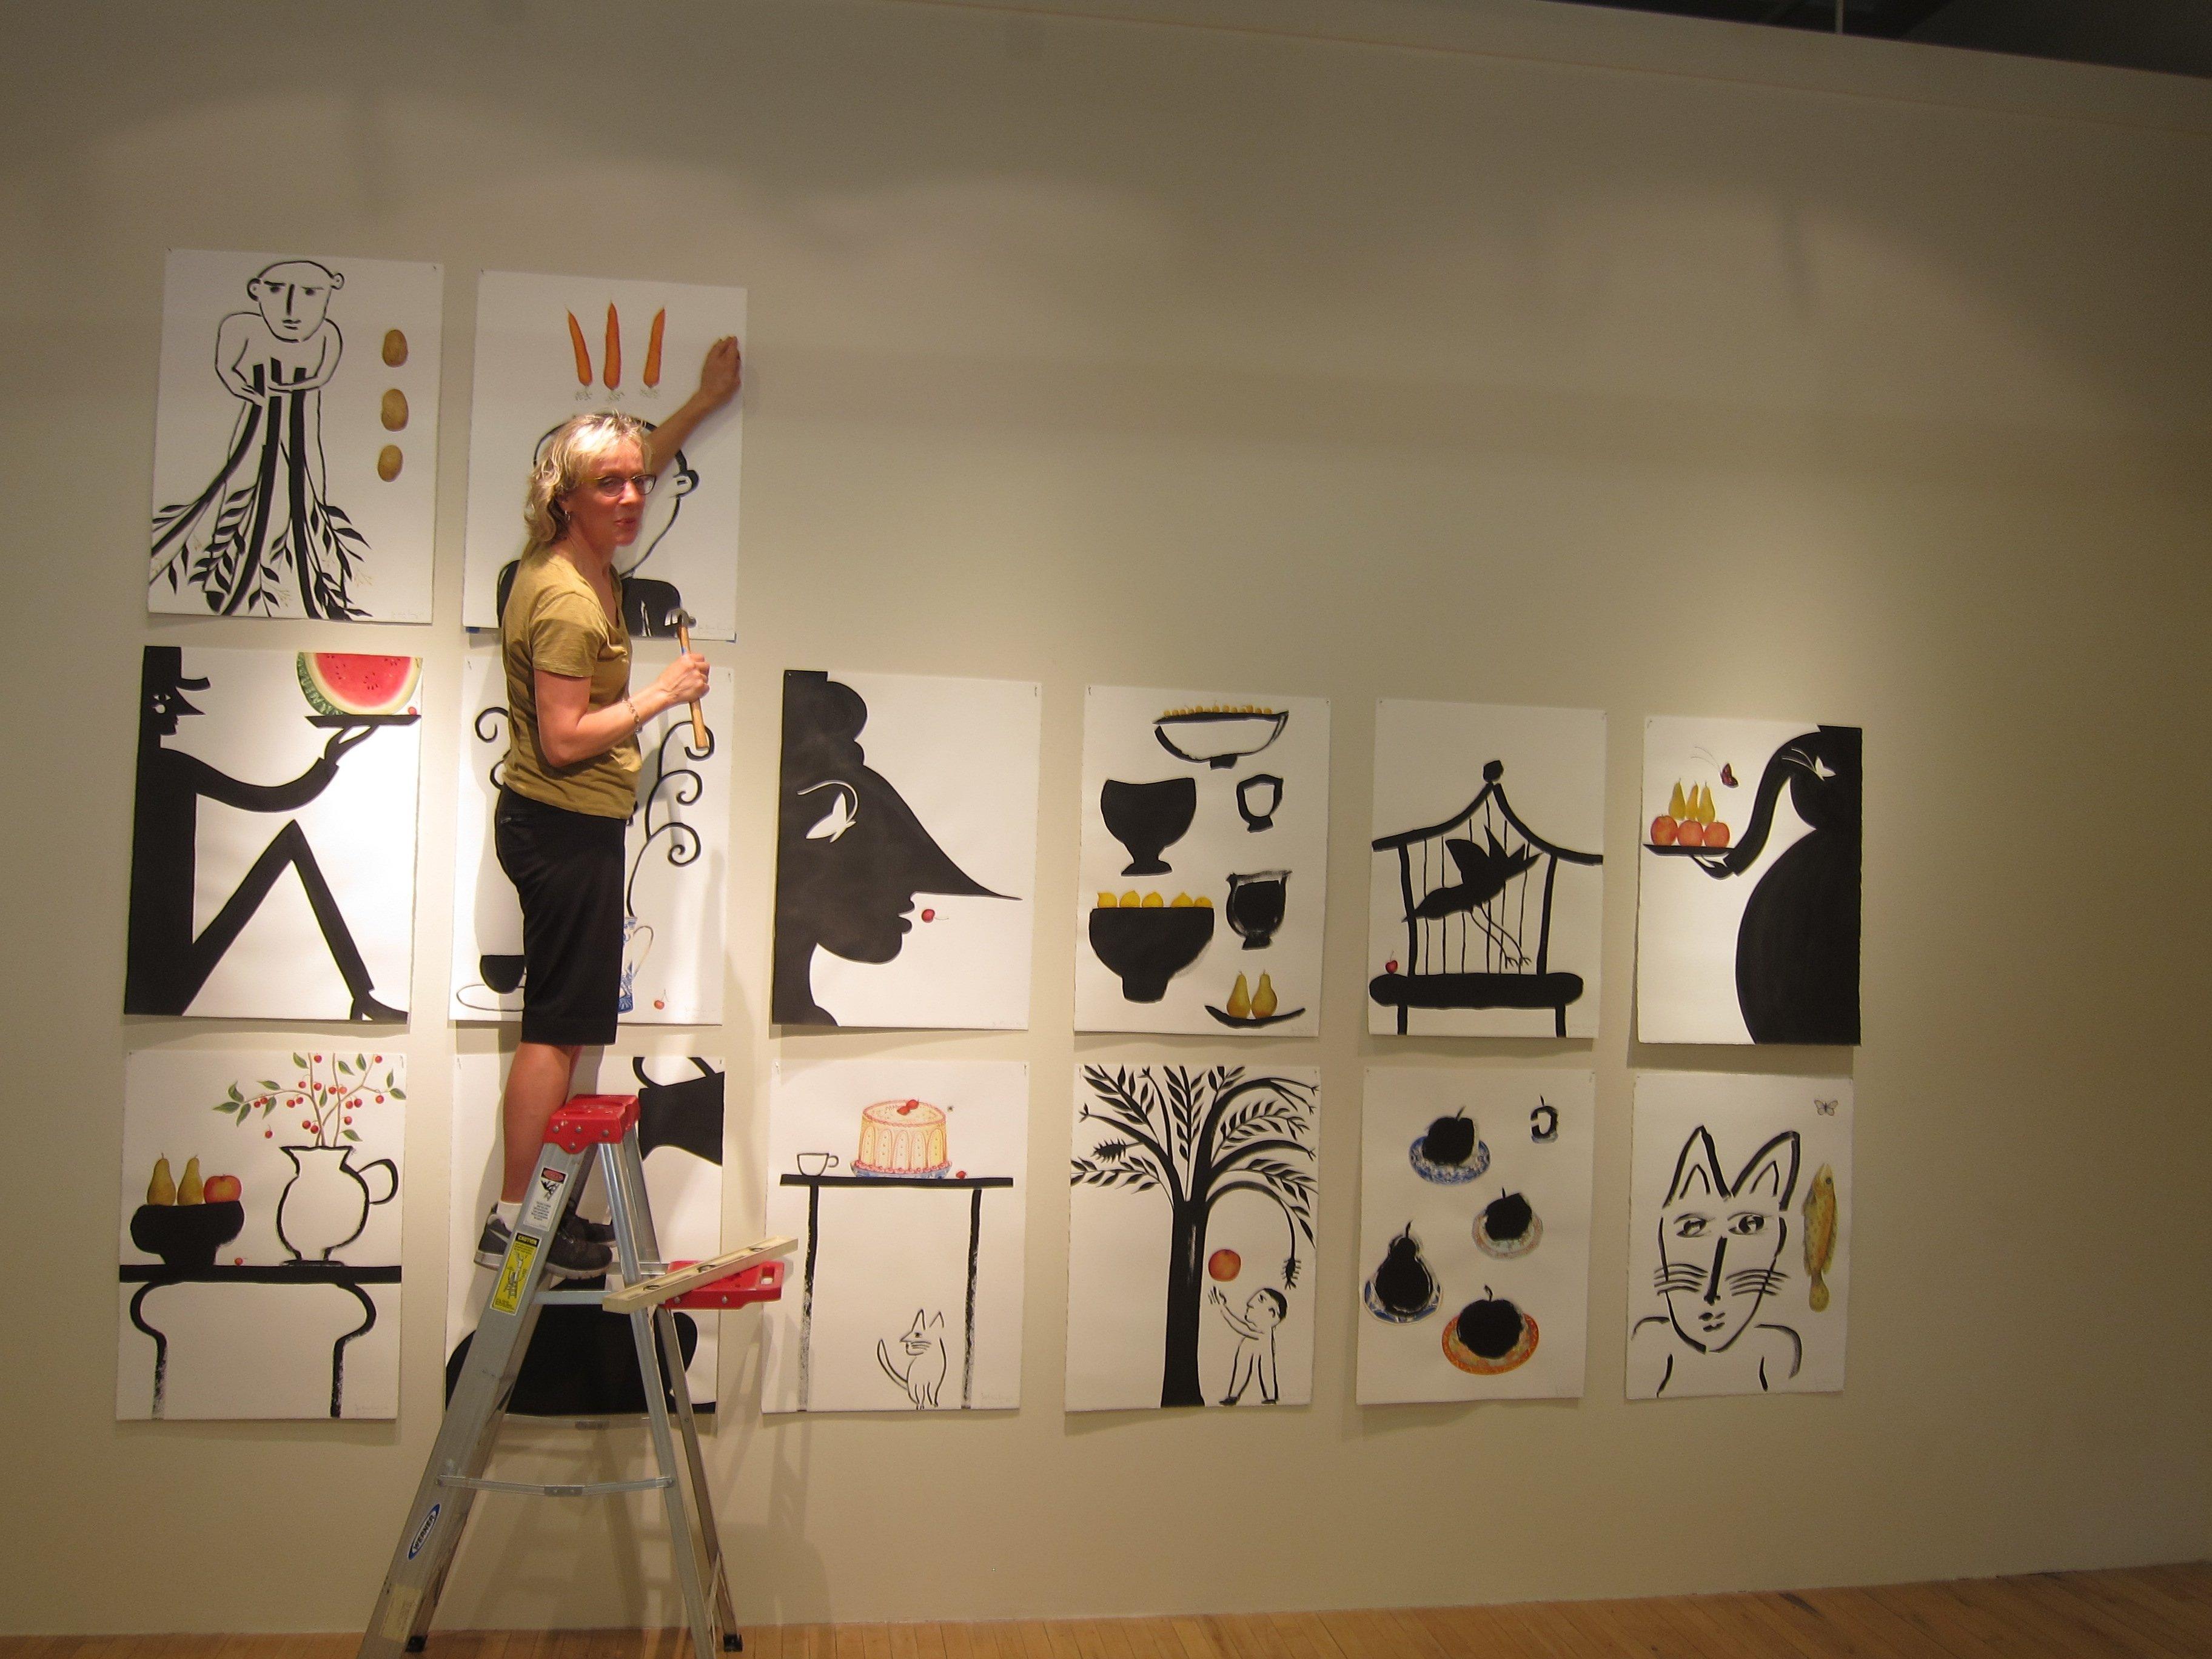 10 Wonderful Creative Painting Ideas For Walls decoration modern creative painting ideas living room paint ideas 2020